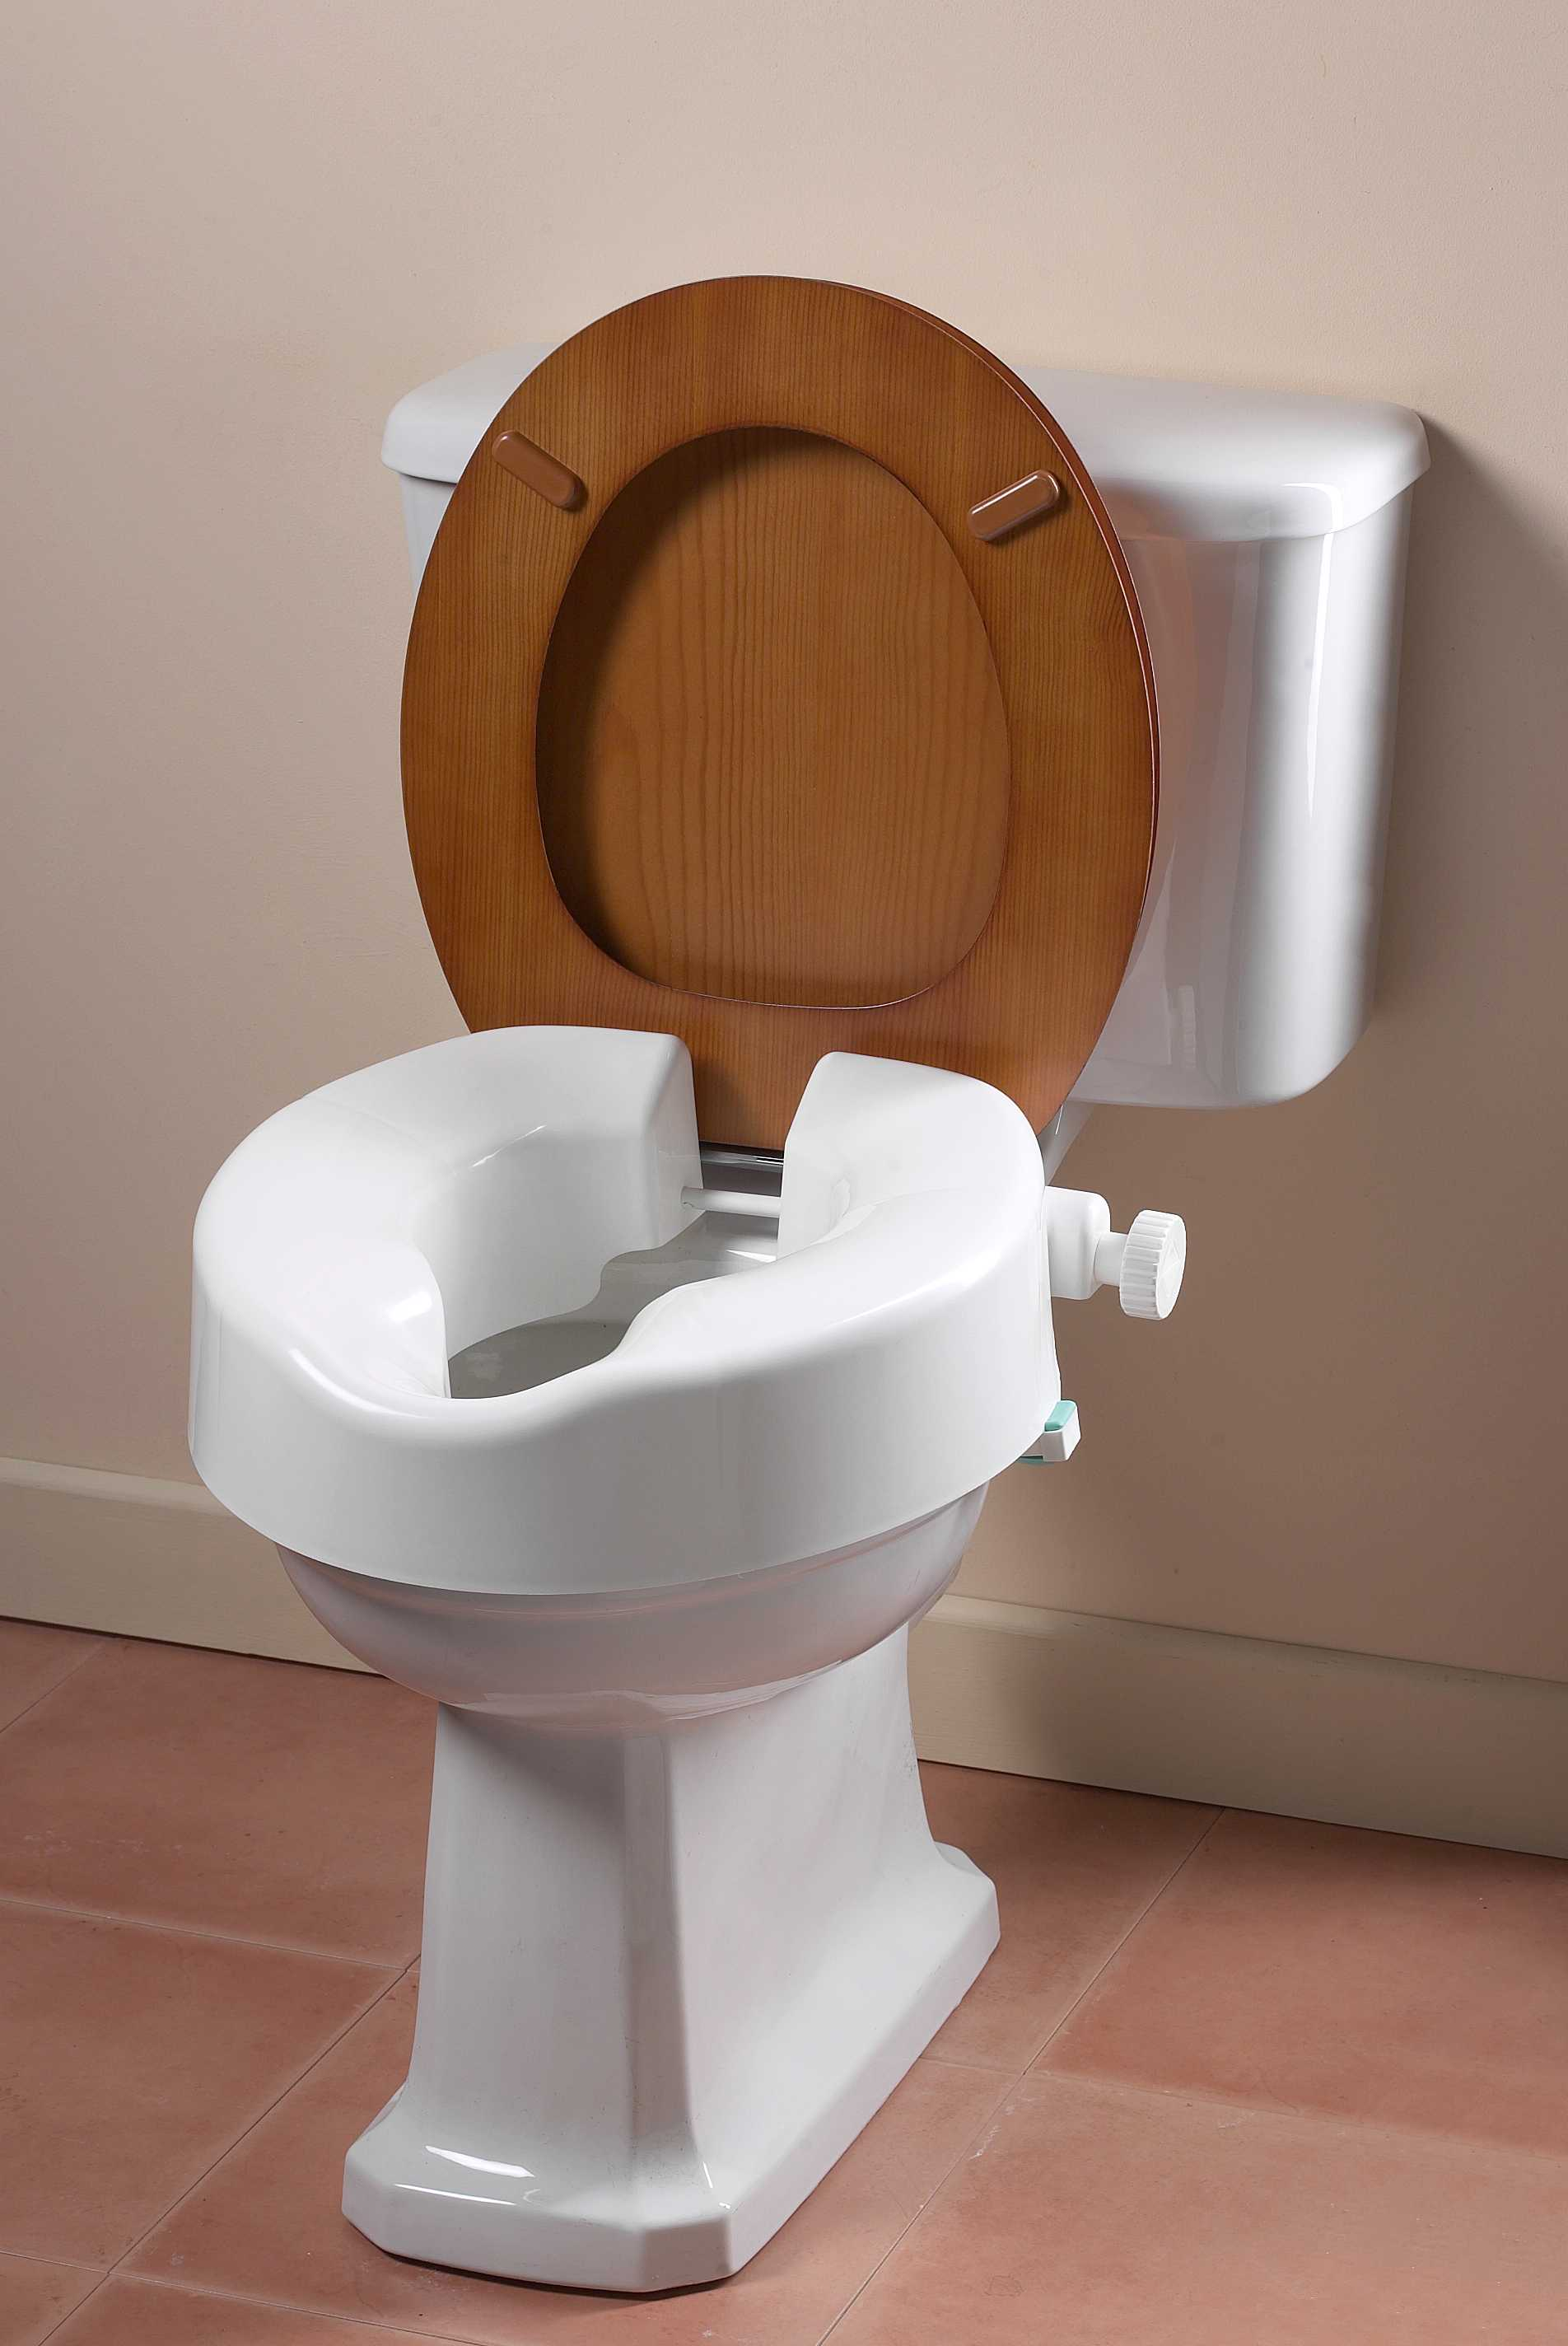 Uni-fix Raised Toilet Seat - Living made easy